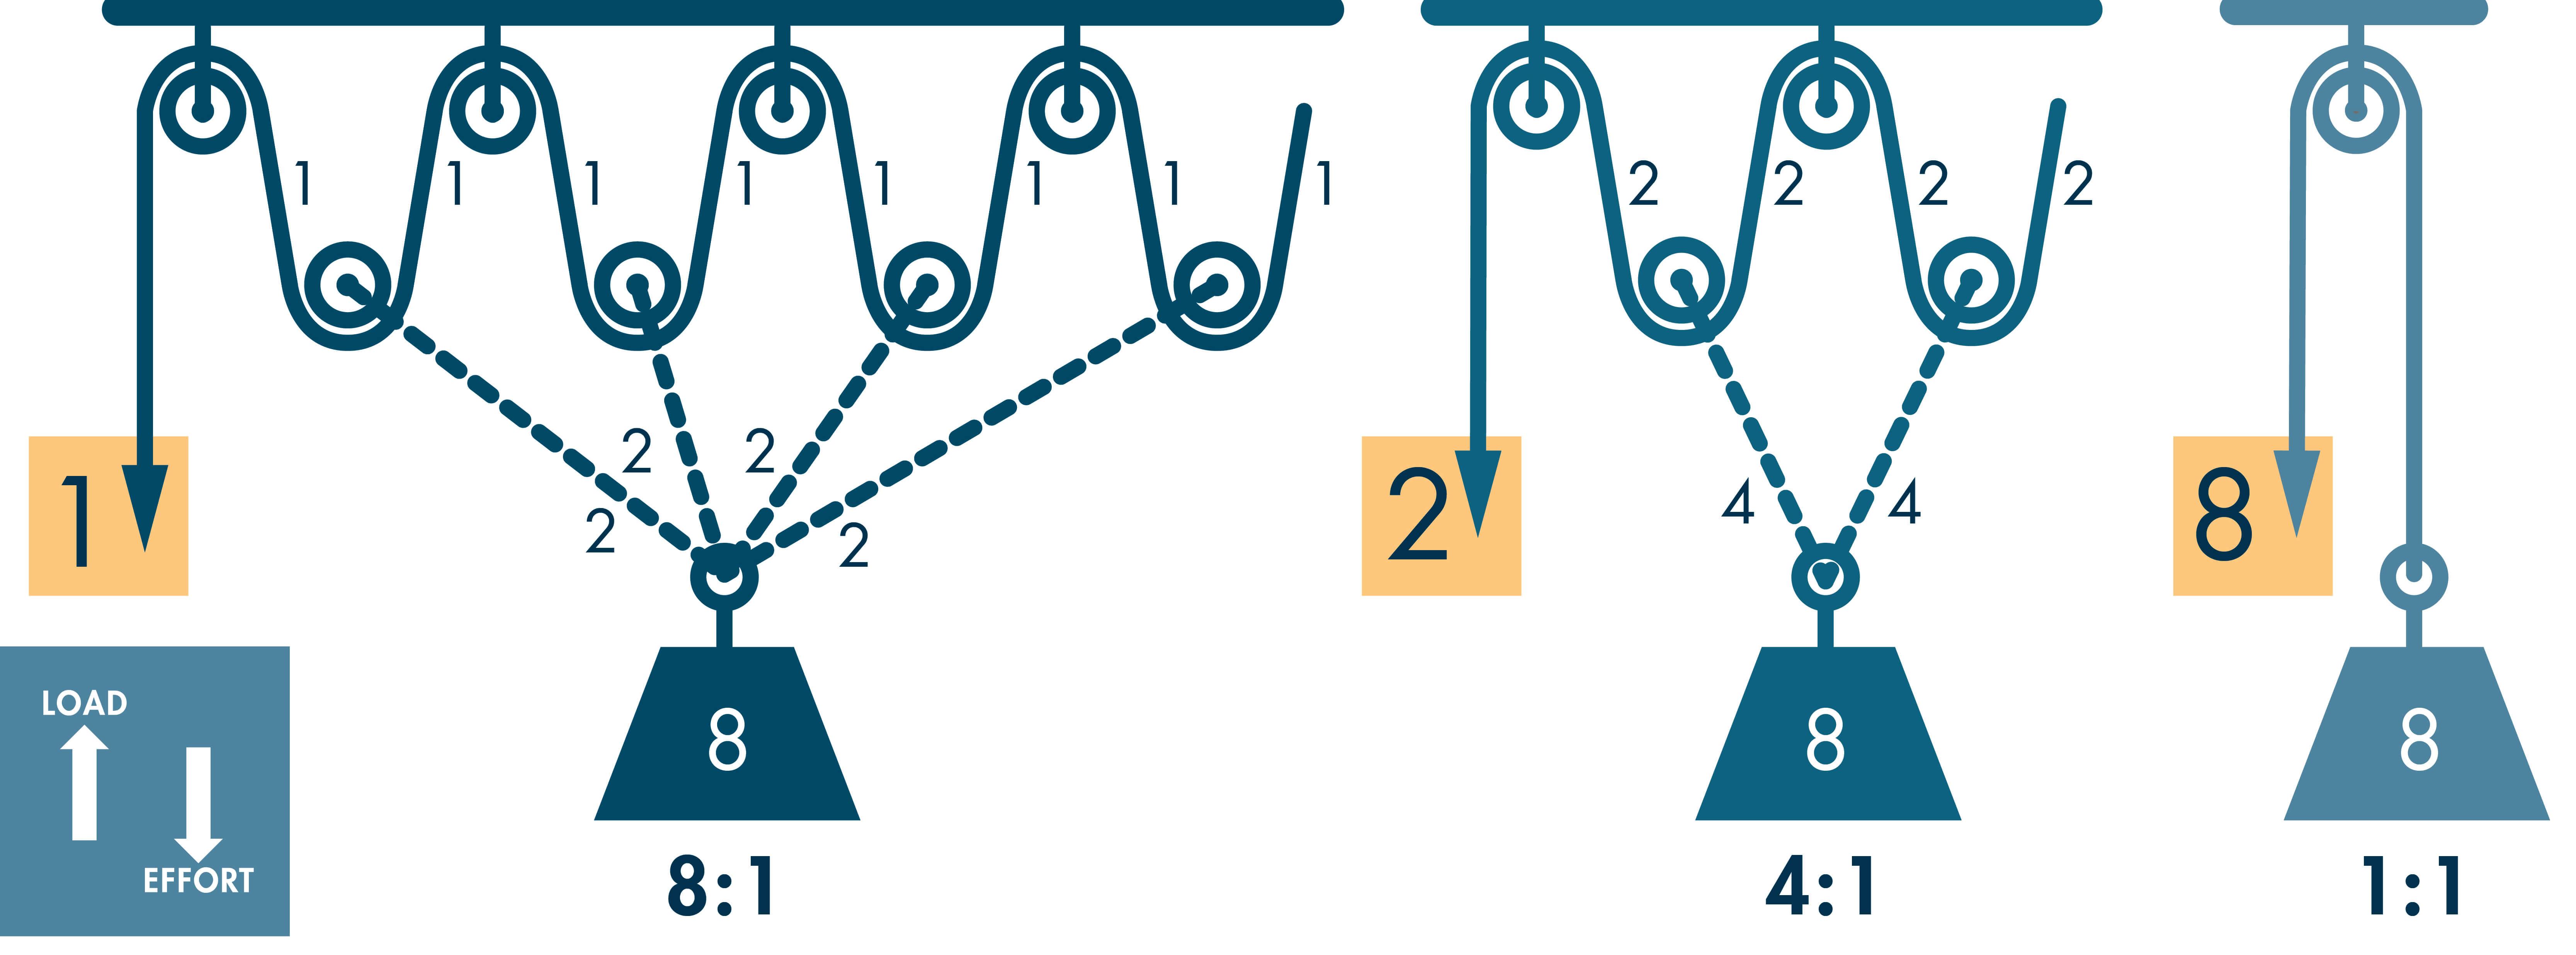 Mechanical Advantage Presentation At Craycroft Elementary